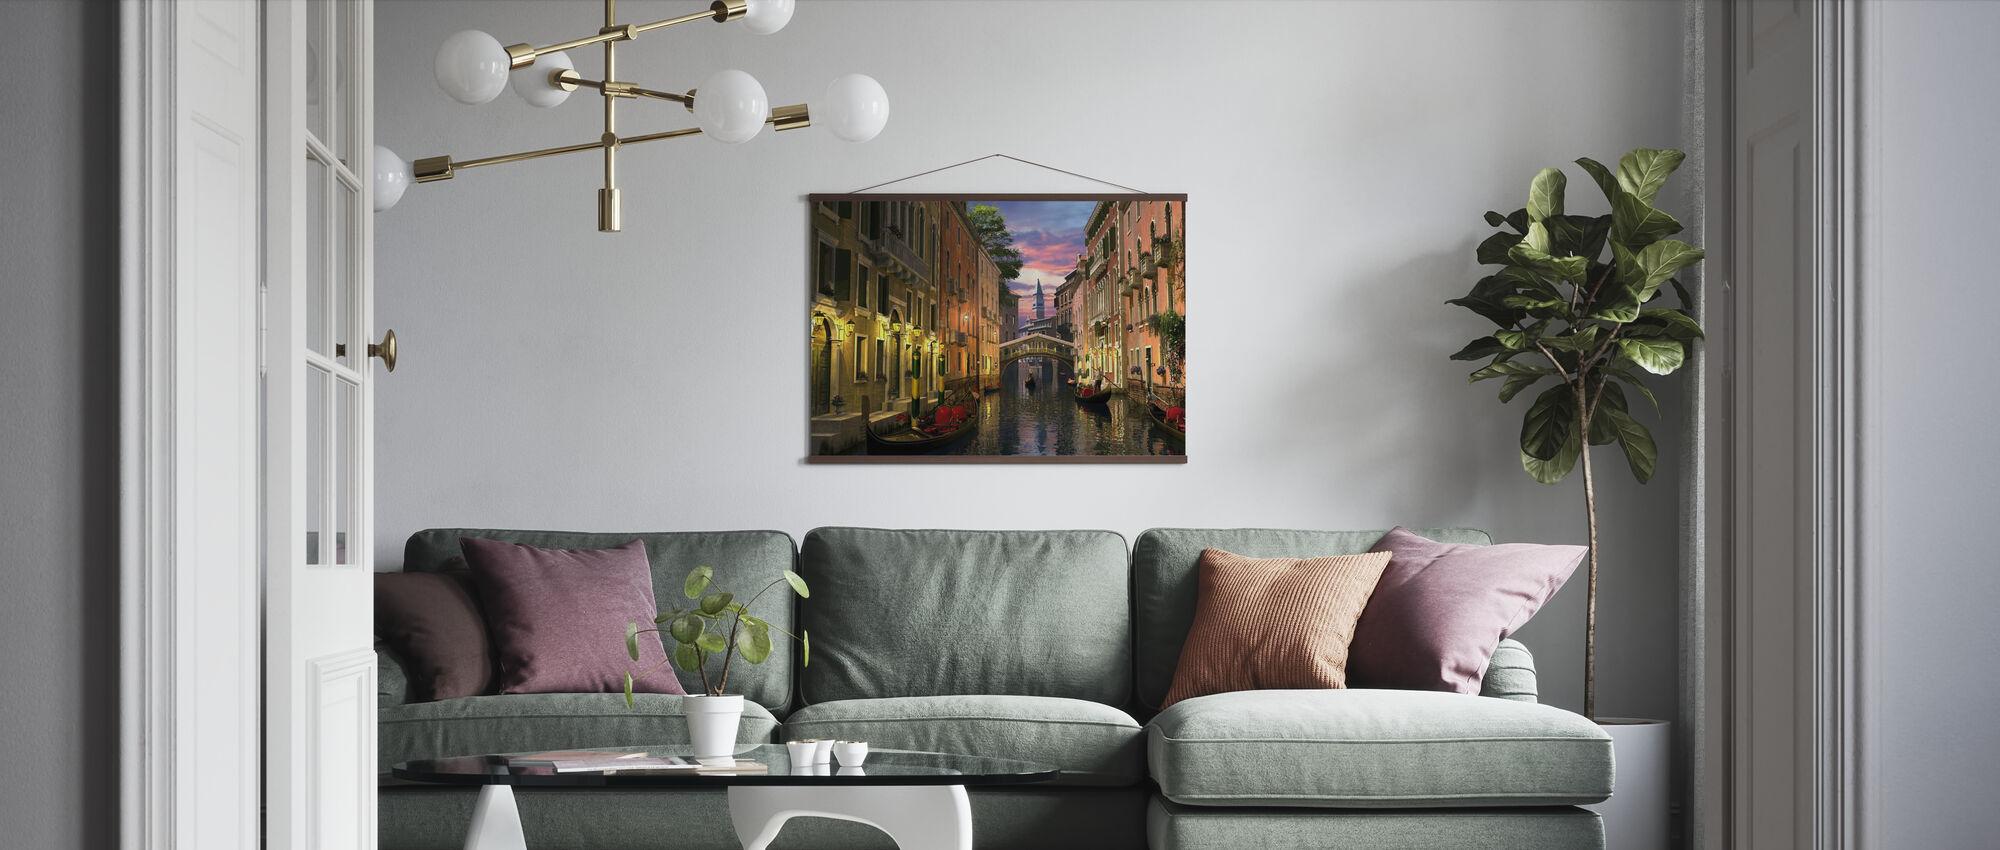 Venezia i skumringen - Plakat - Stue